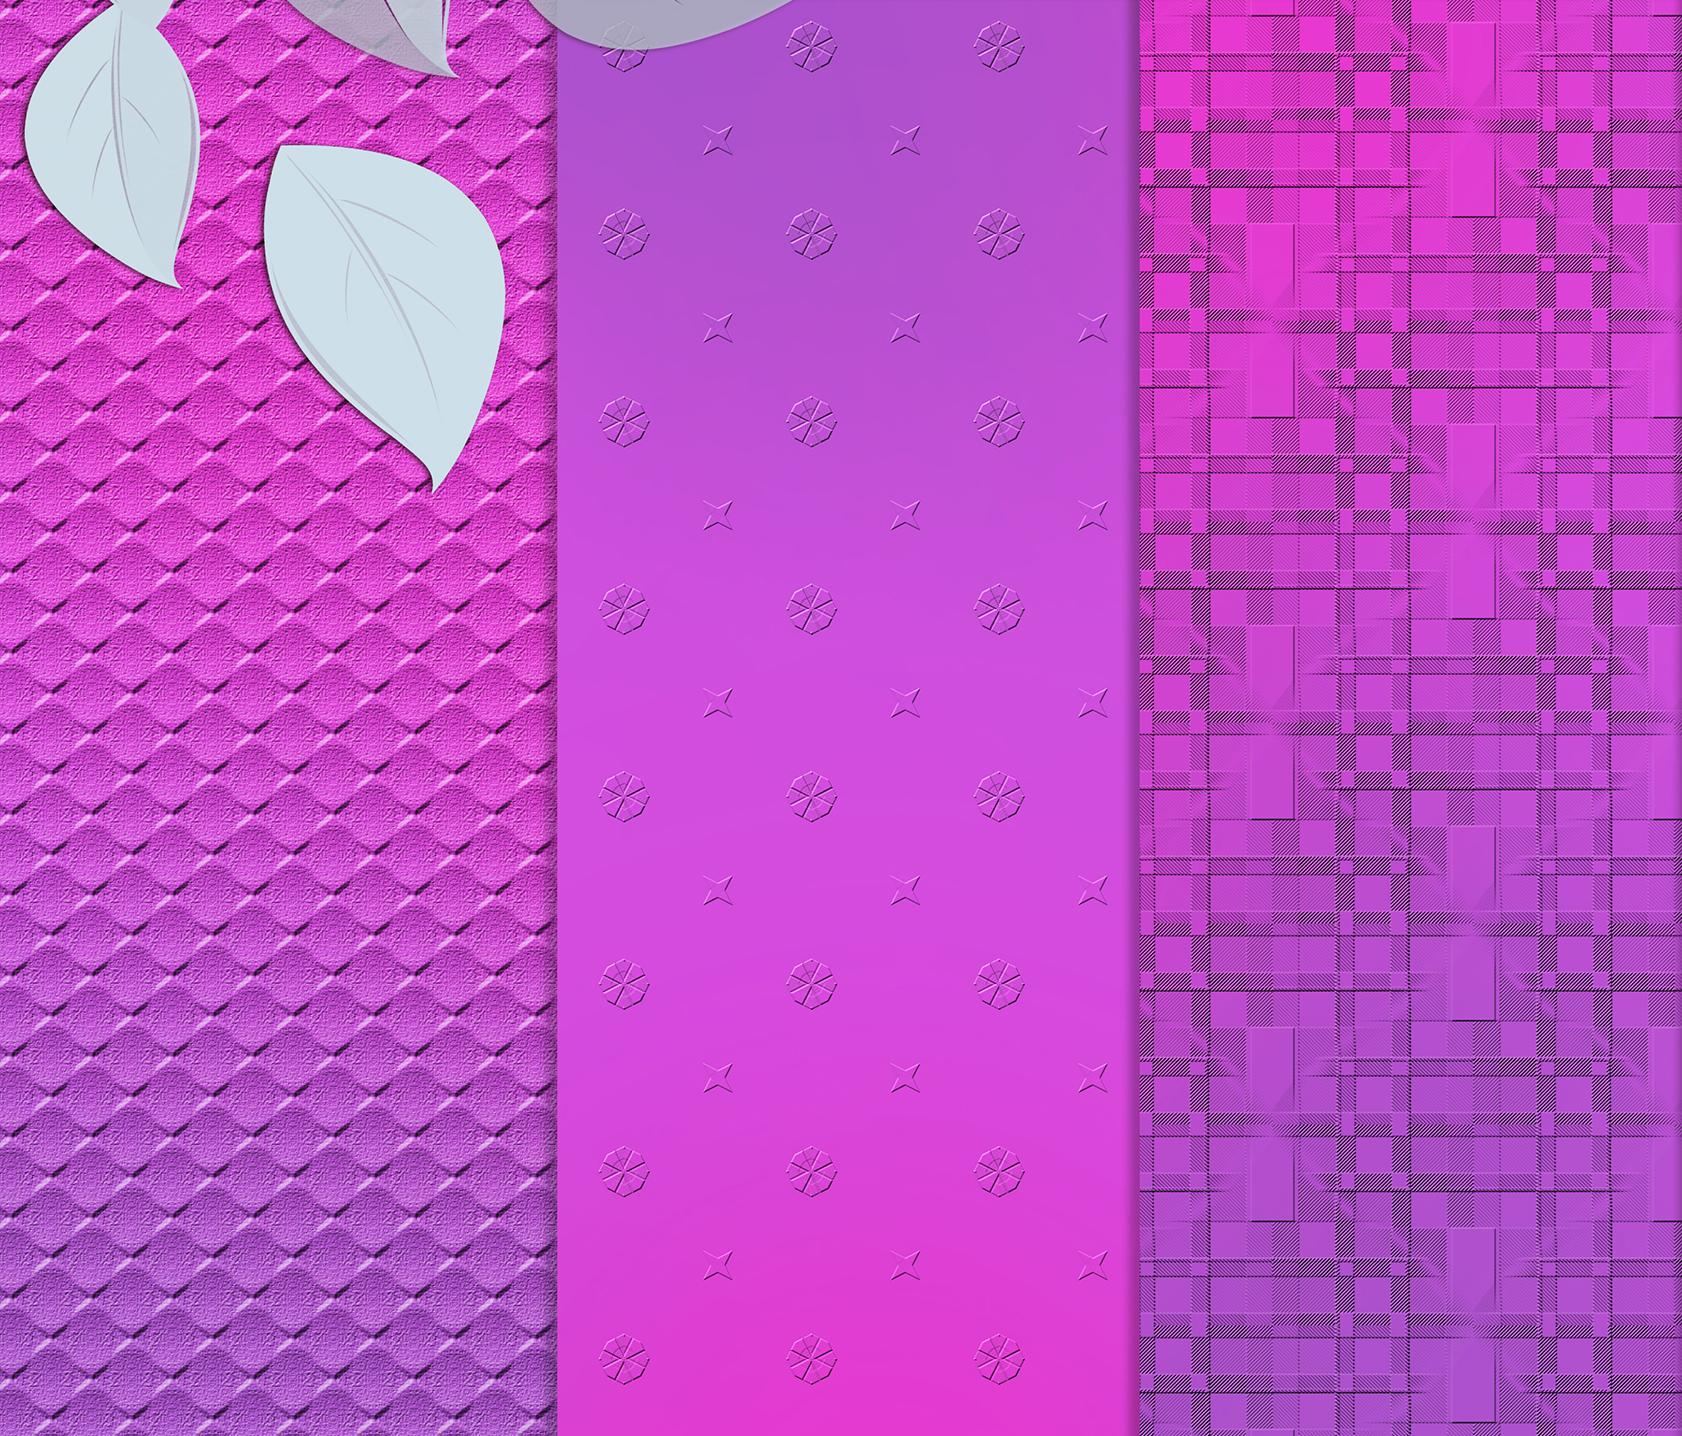 Purple-blue abstract textures, Digital Scrapbook Paper example image 3